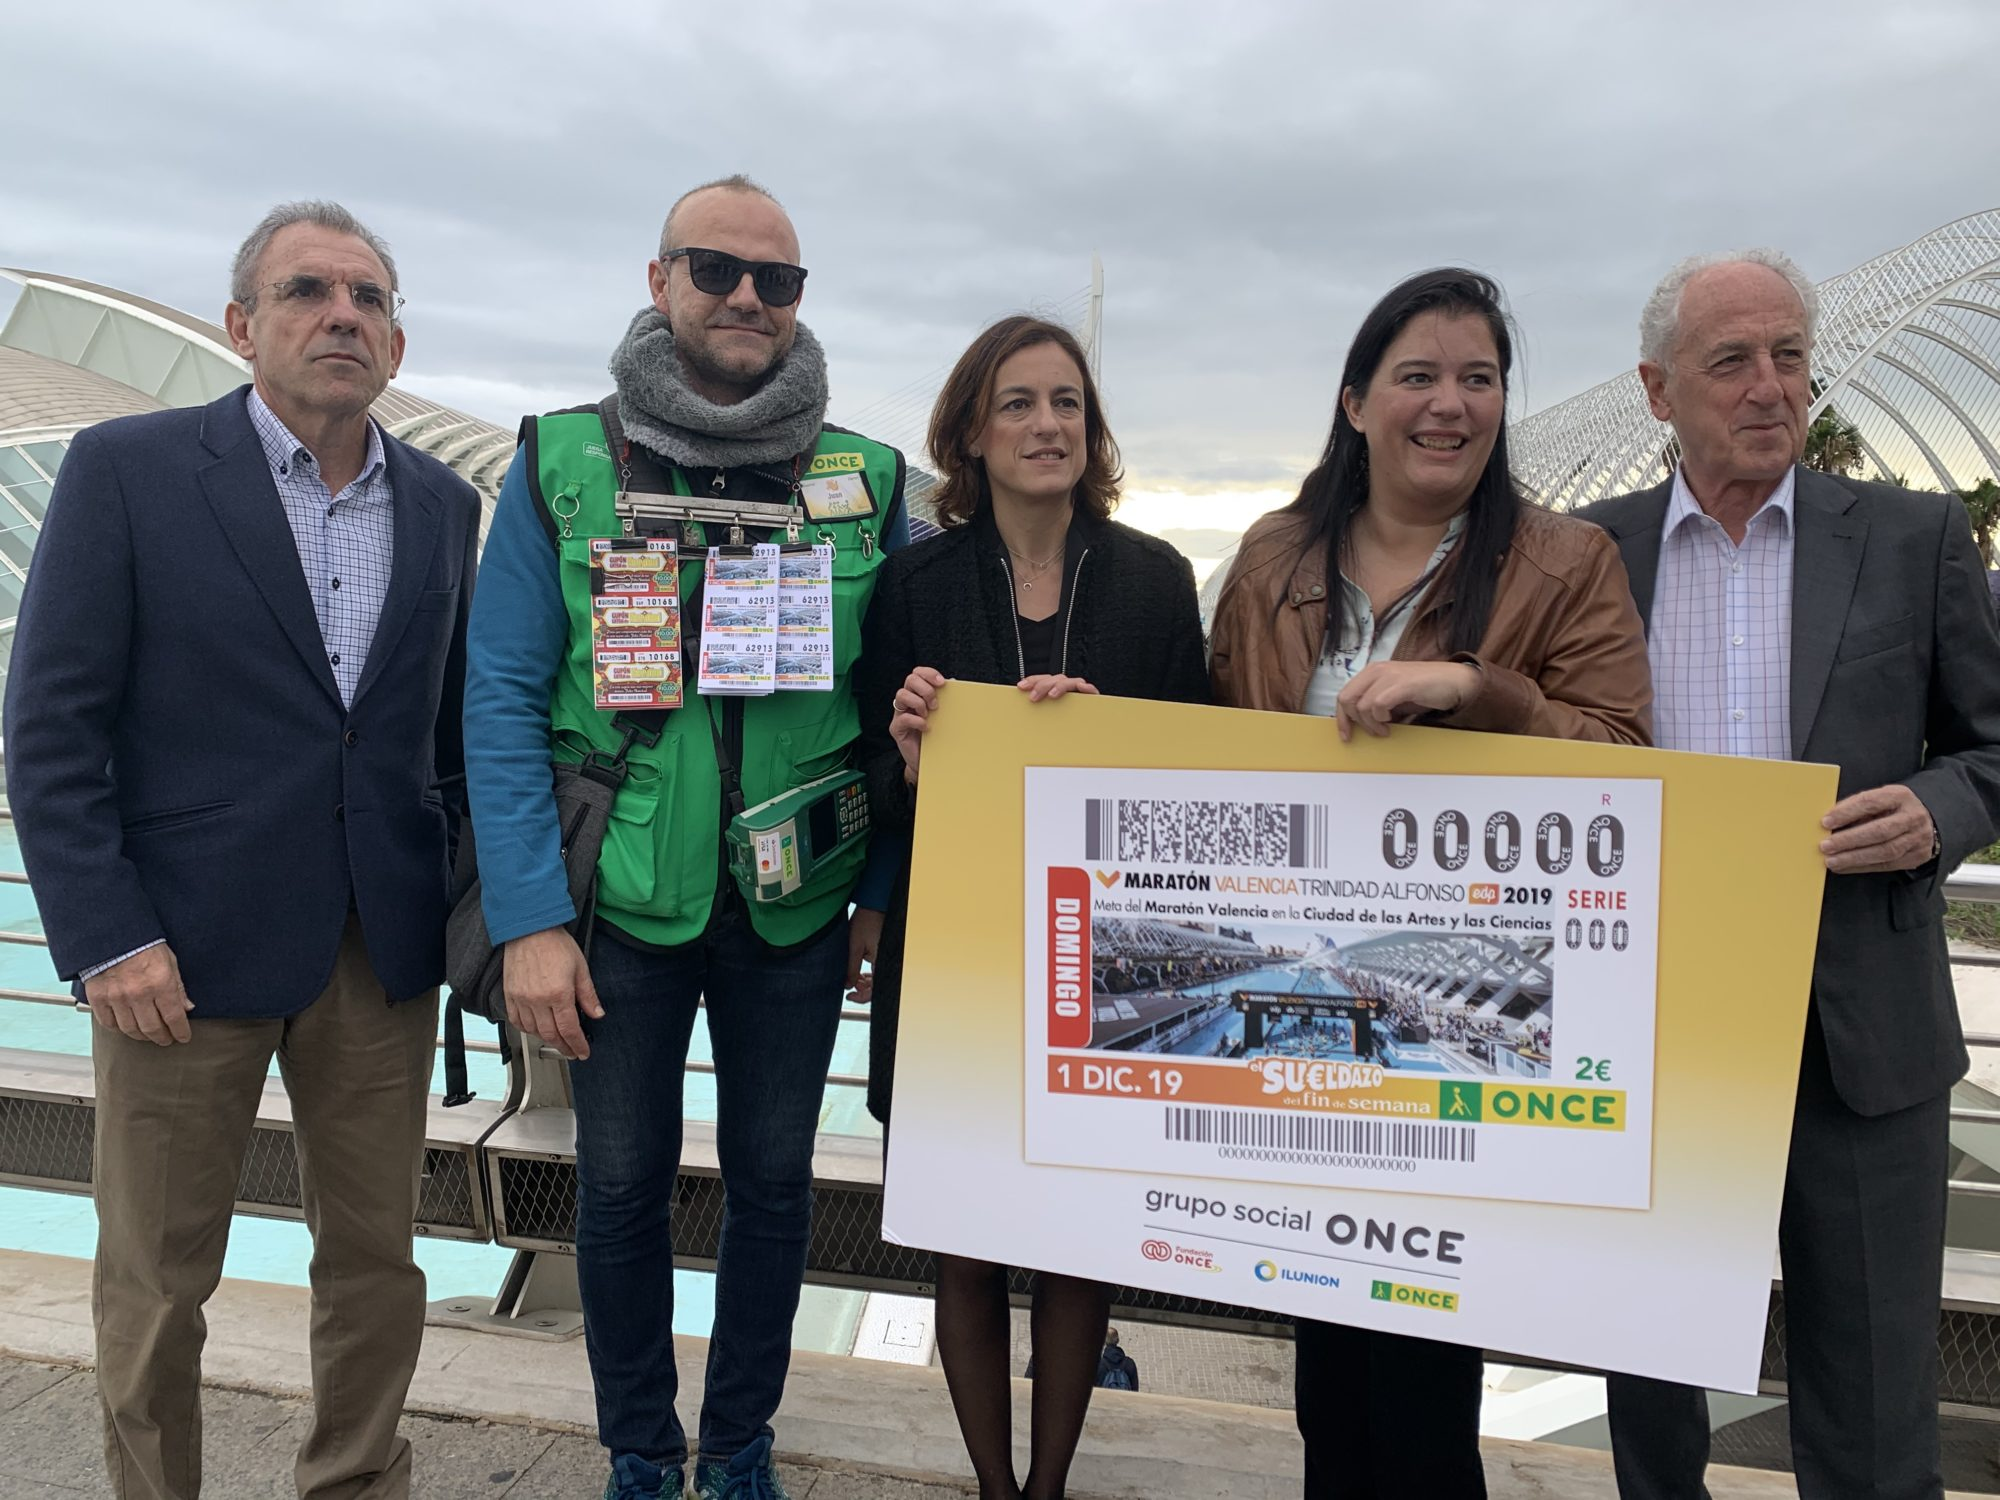 Cupon ONCE - Maratón Valencia 2019